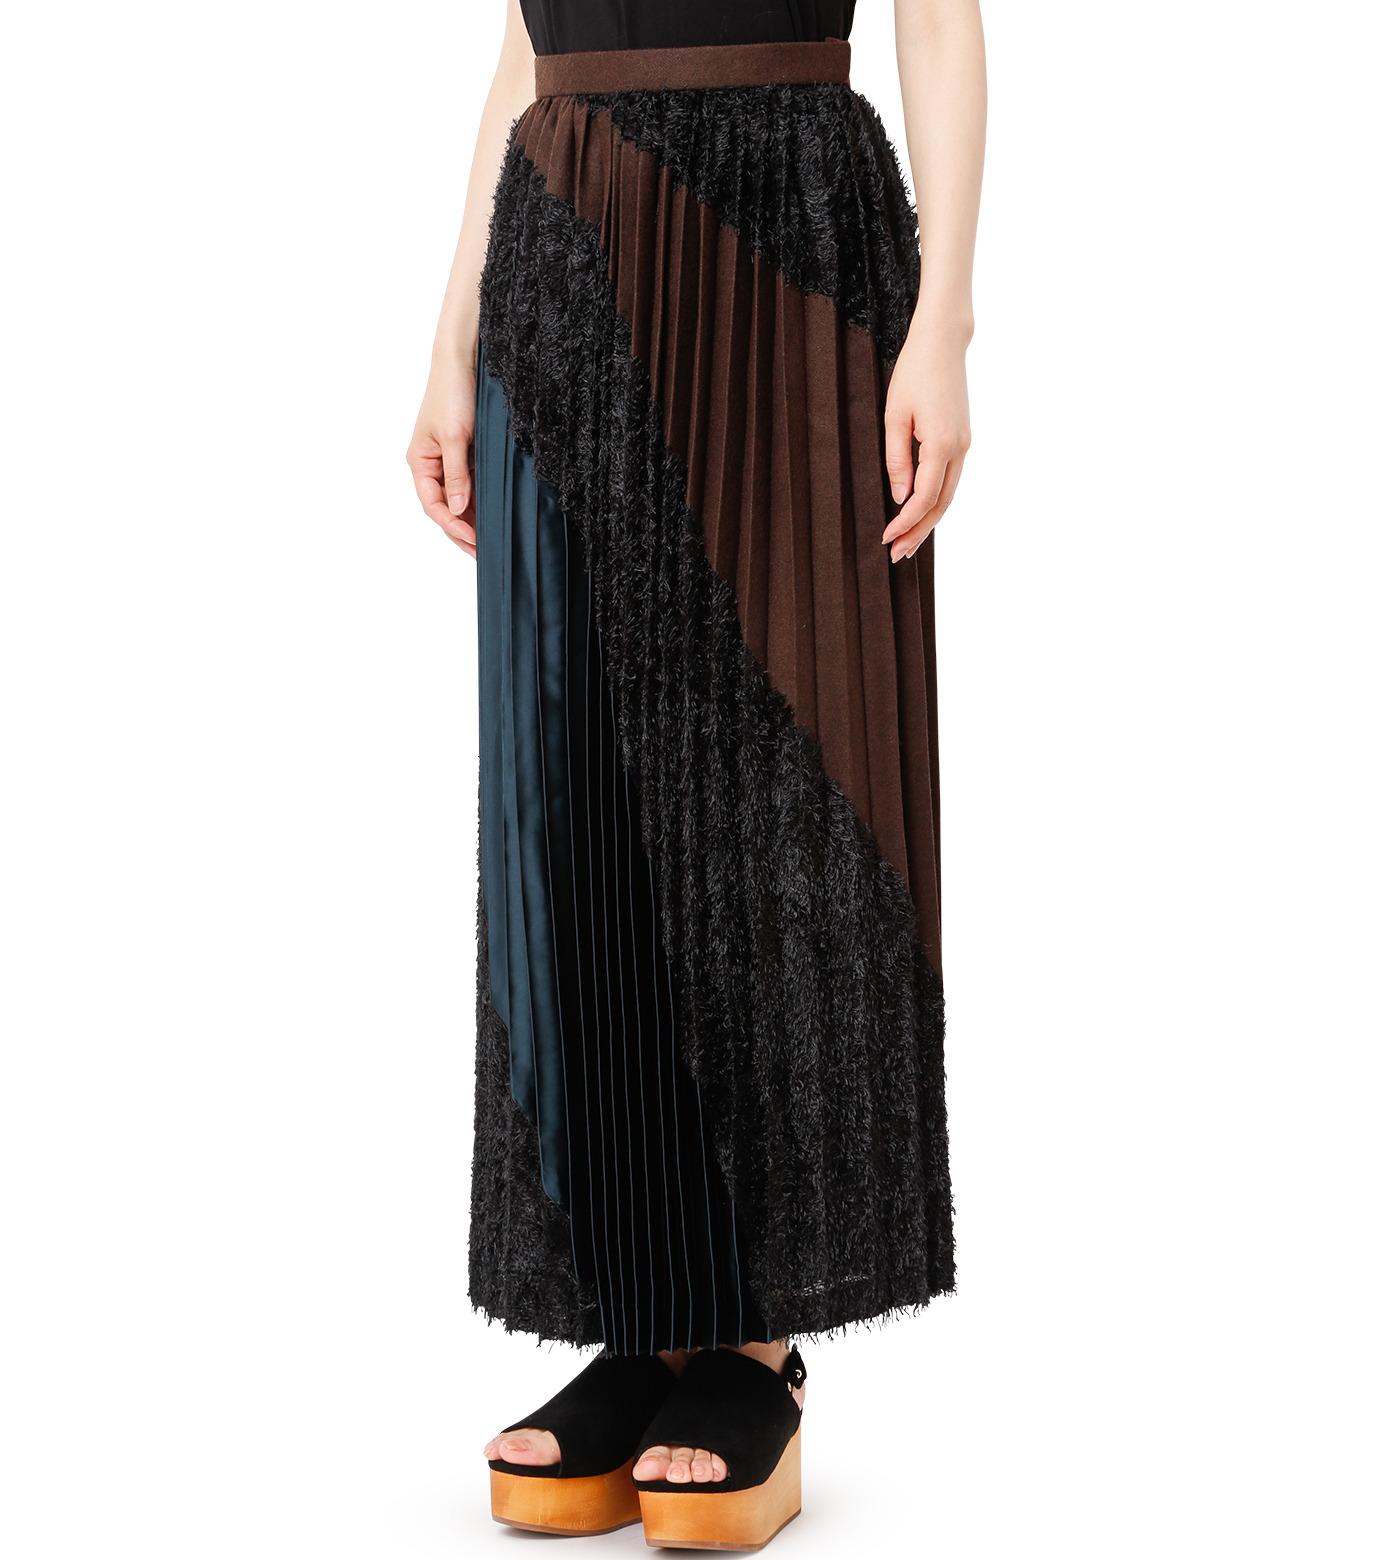 KOLOR(カラー)のLong Pleated Skirt Mixed Jacquard-BLACK(スカート/skirt)-16WCL-S03129-13 拡大詳細画像1